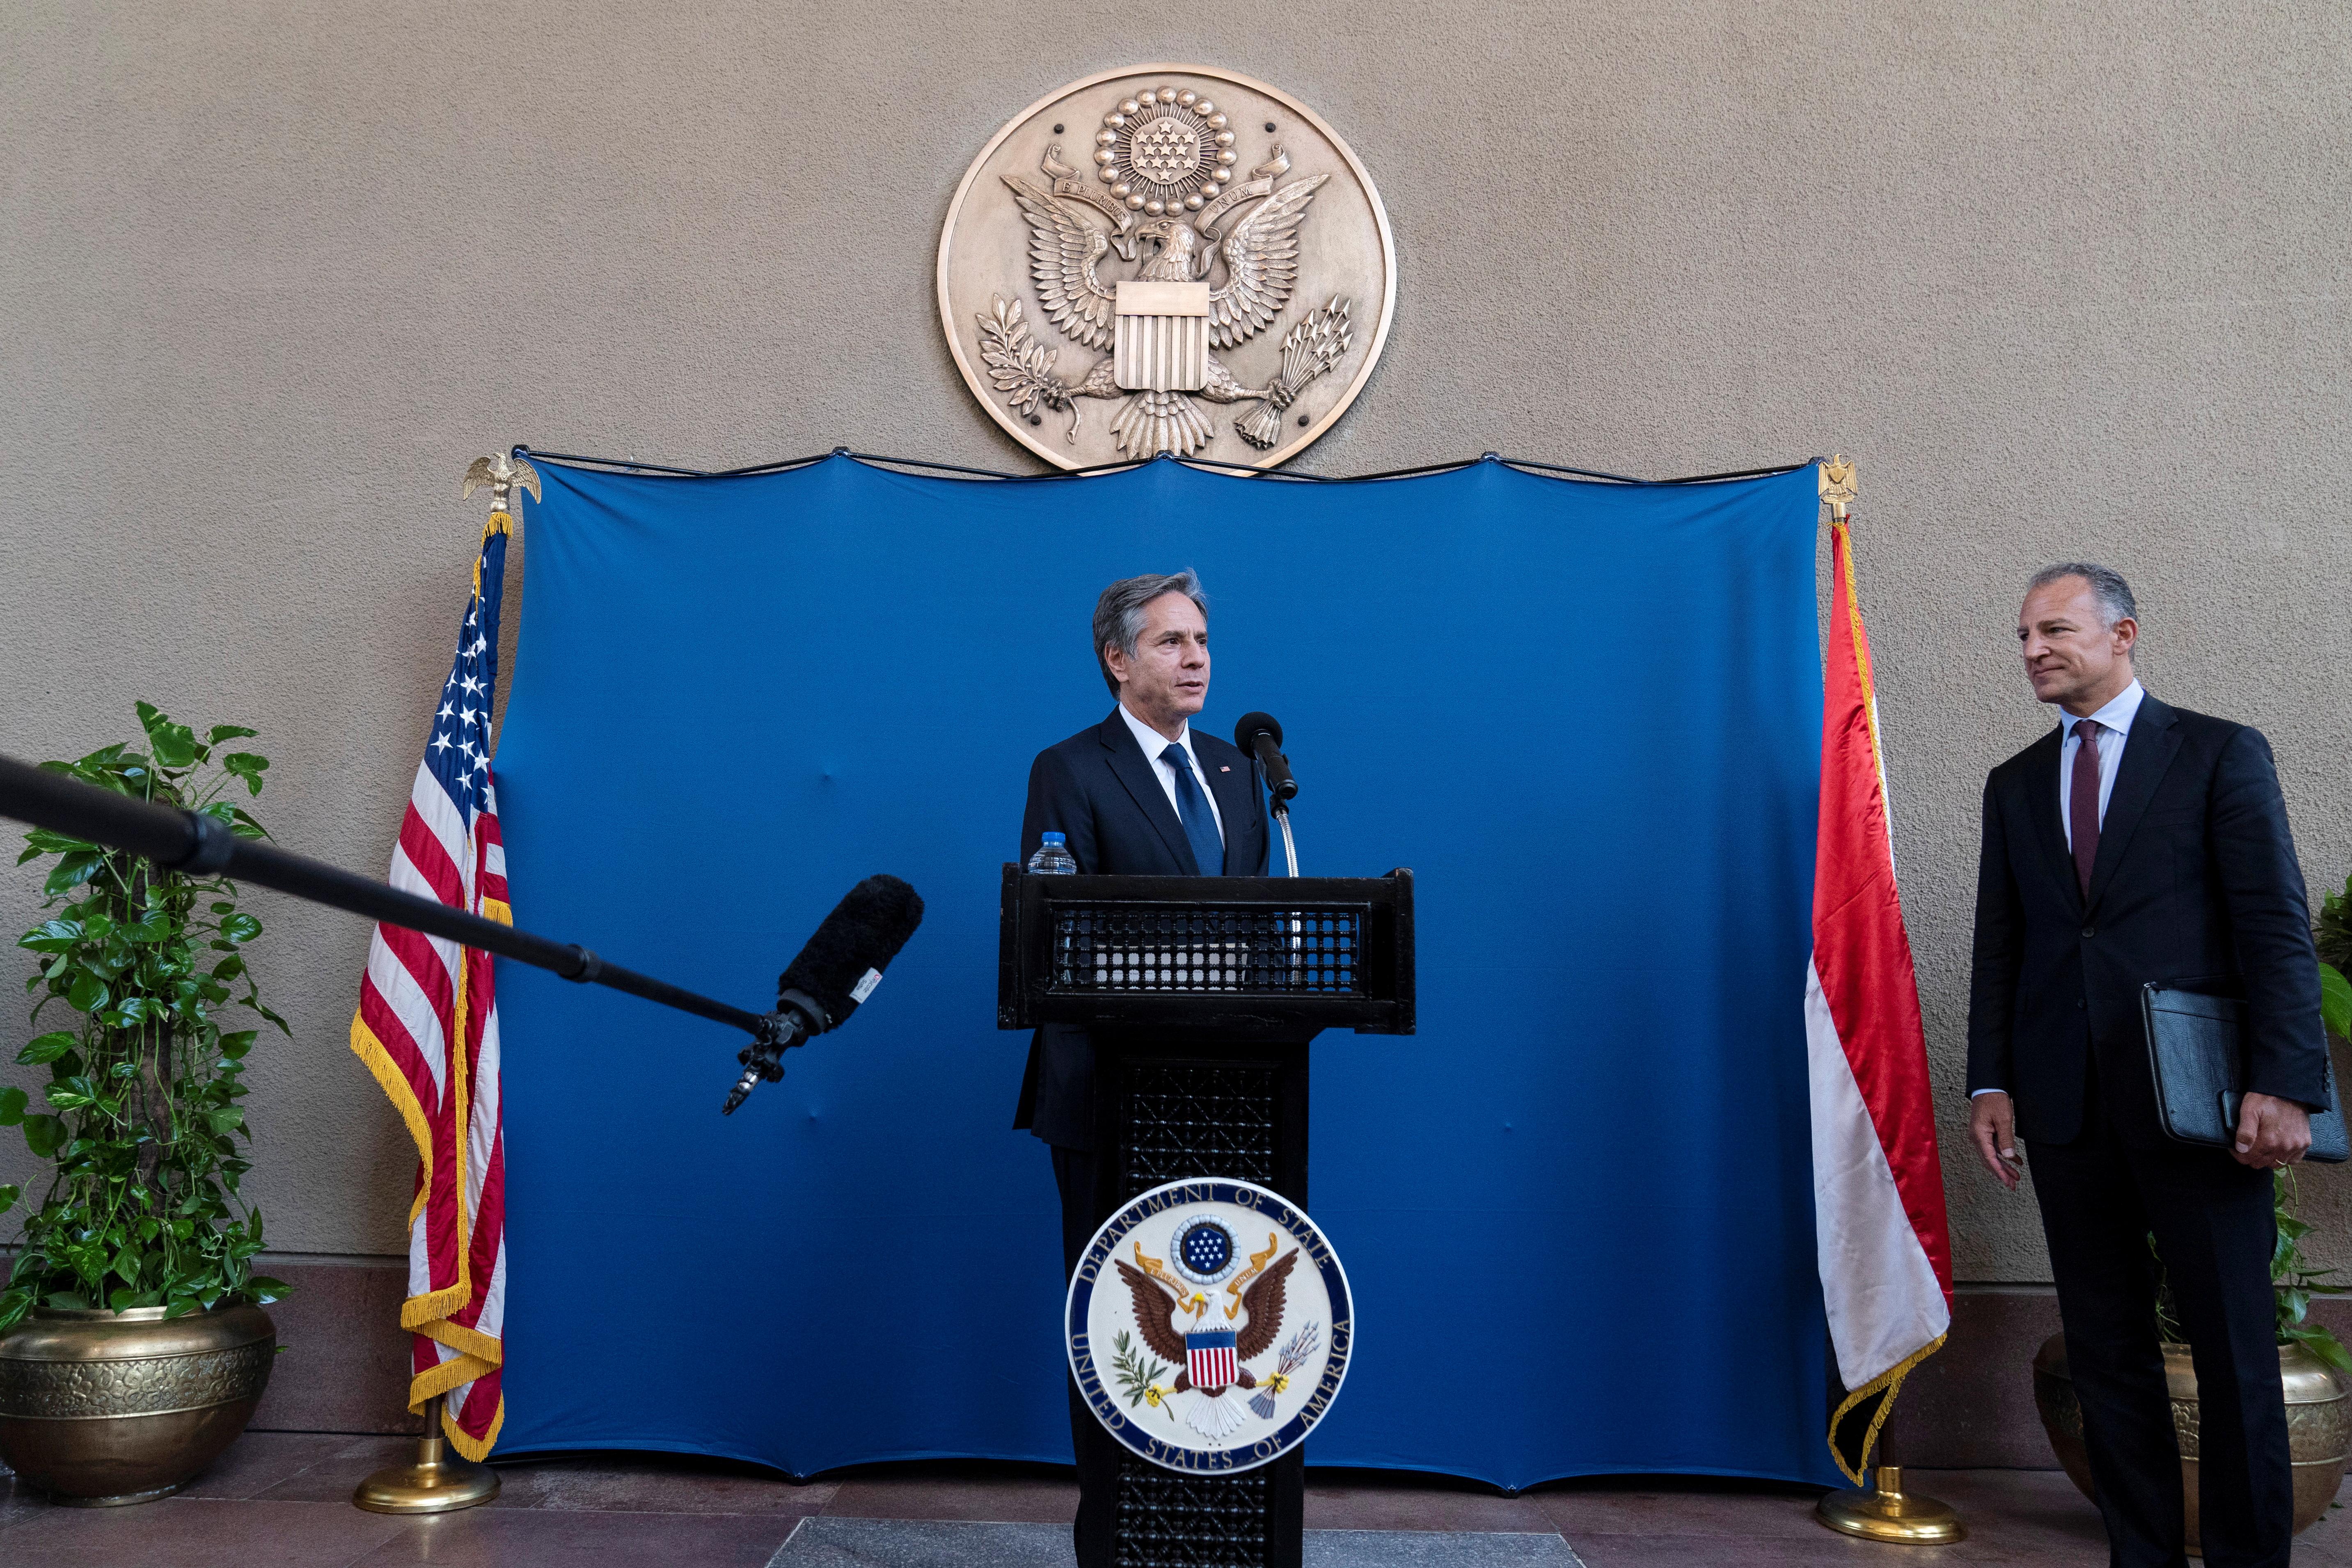 U.S. Secretary of State Antony Blinken speaks as he greets staff members of the U.S. Embassy to Egypt, in Cairo, Egypt May 26, 2021. Alex Brandon/Pool via REUTERS